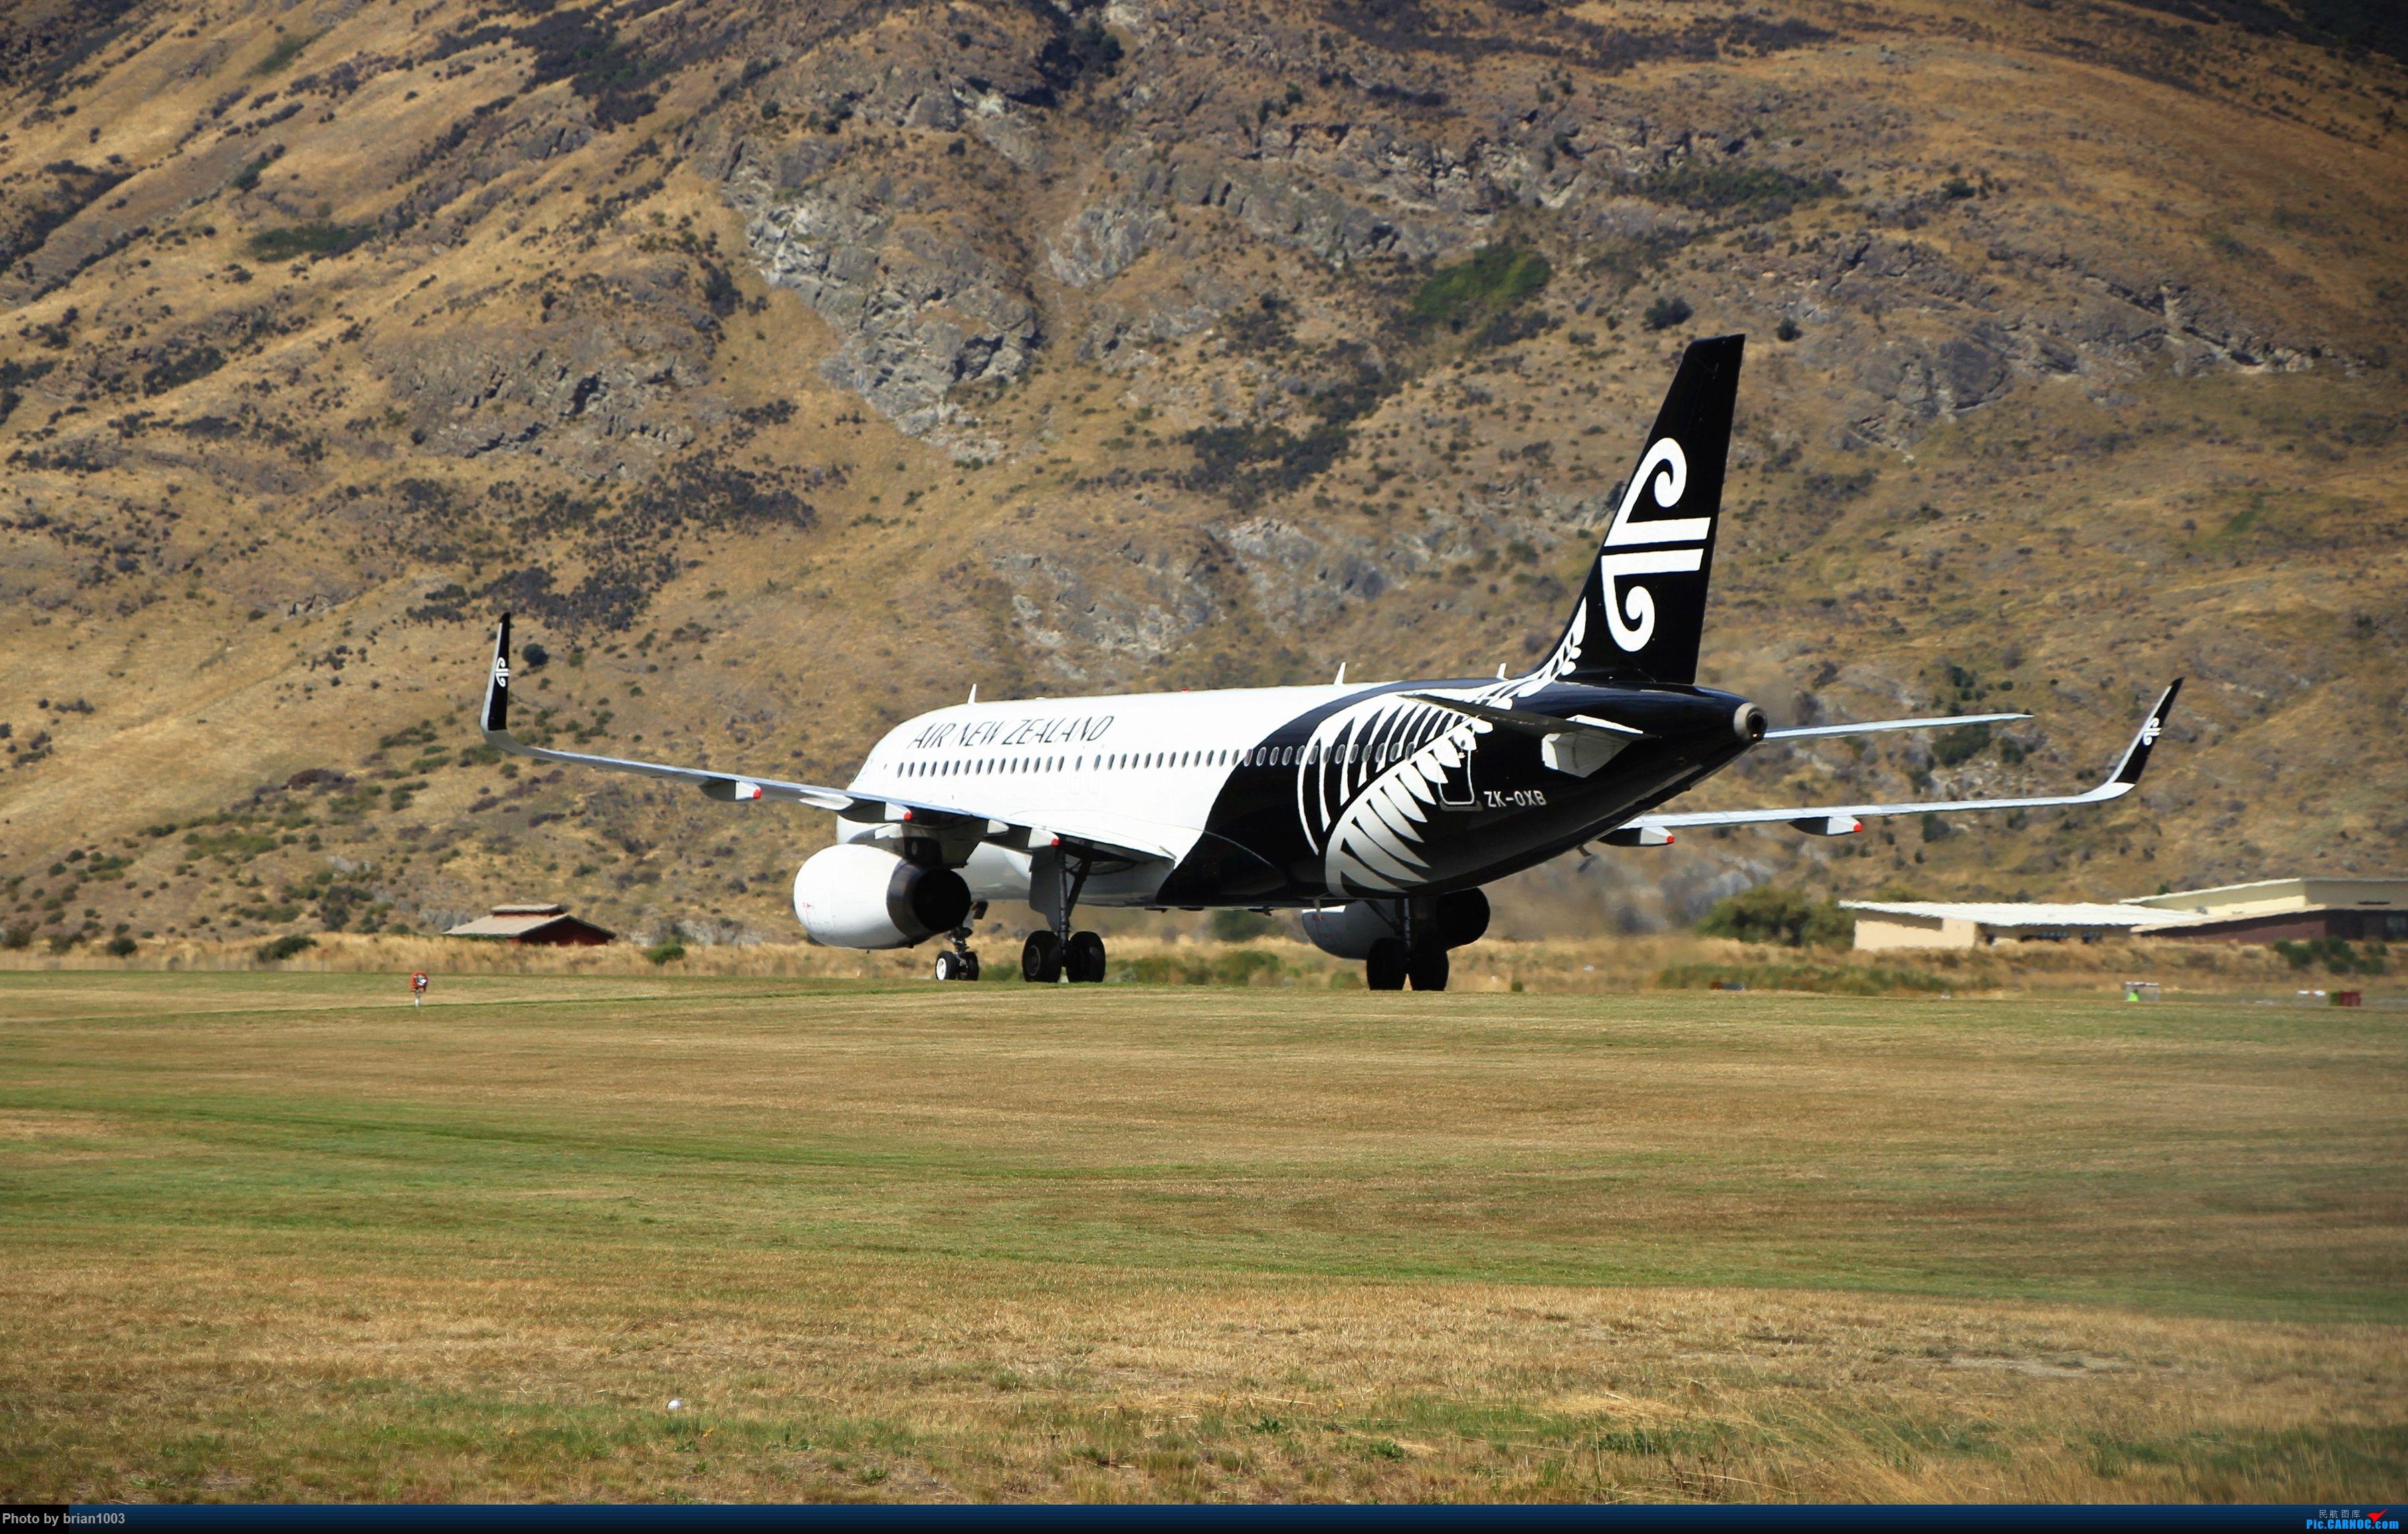 Re:[原创]CZ3347-CZ617-JQ292-CZ306-CZ659,中土之国屌丝舱自驾流水账 AIRBUS A320 ZK-OXB 新西兰皇后镇机场